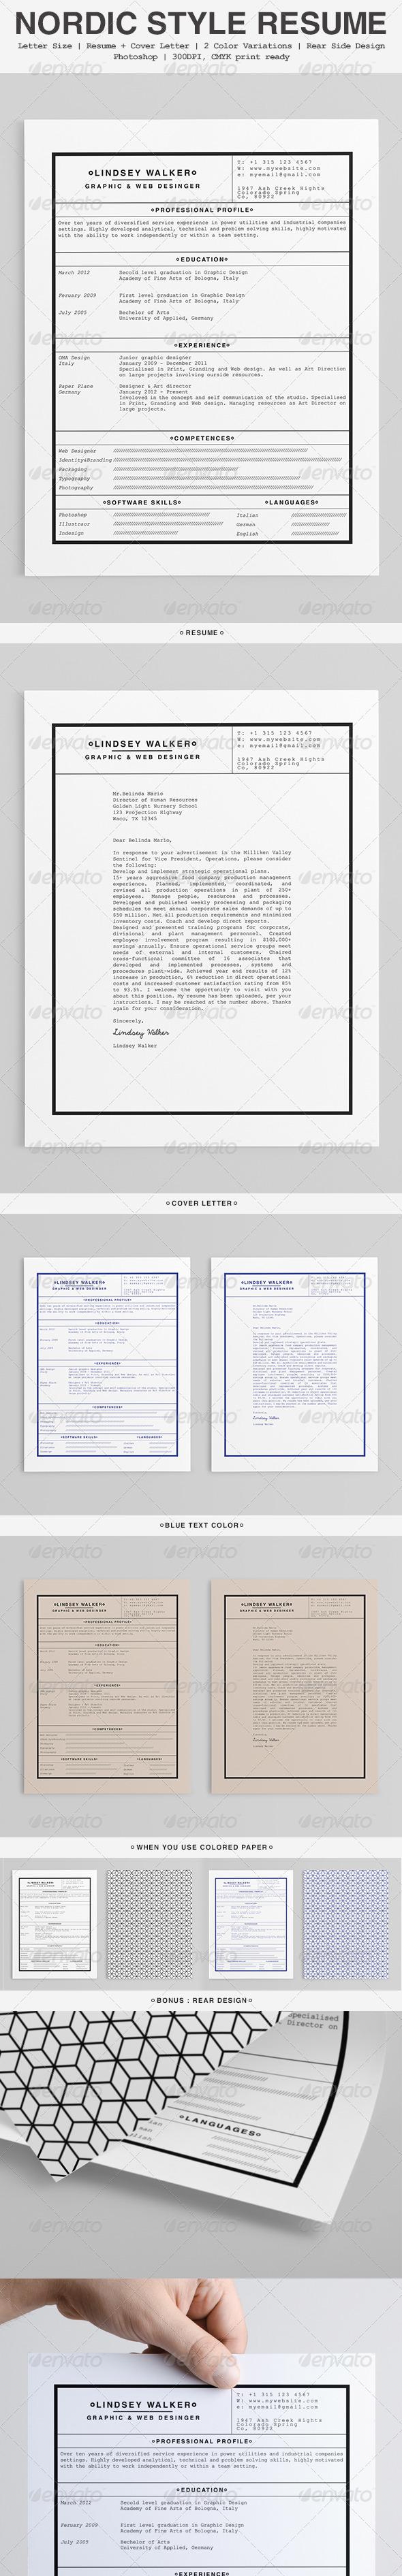 GraphicRiver Nordic Style Minimalist Resume 5524283